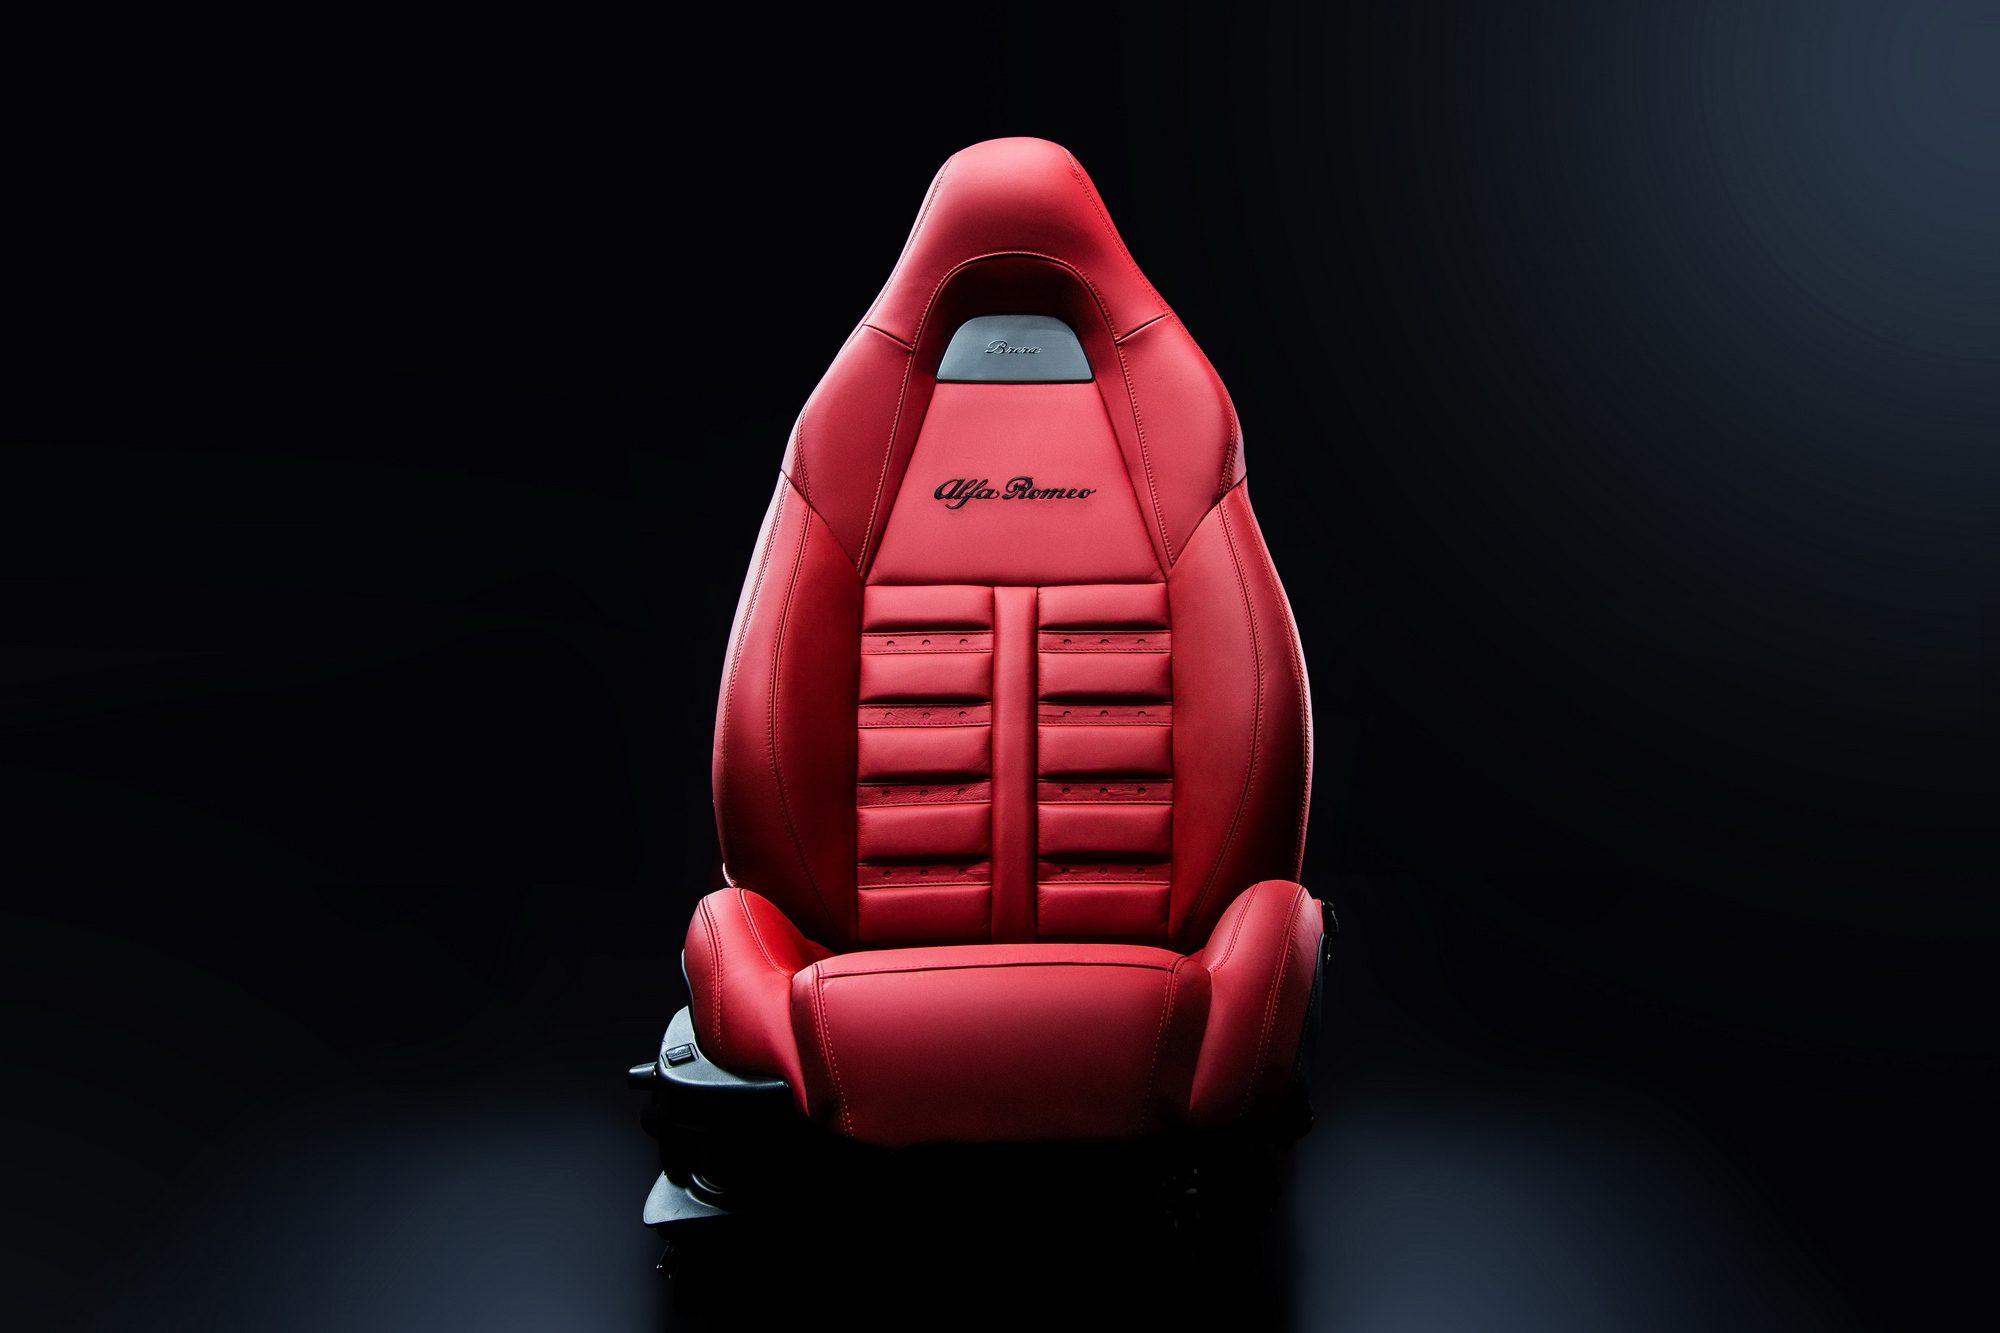 alfa romeo brera car upholstery szczecin. Black Bedroom Furniture Sets. Home Design Ideas